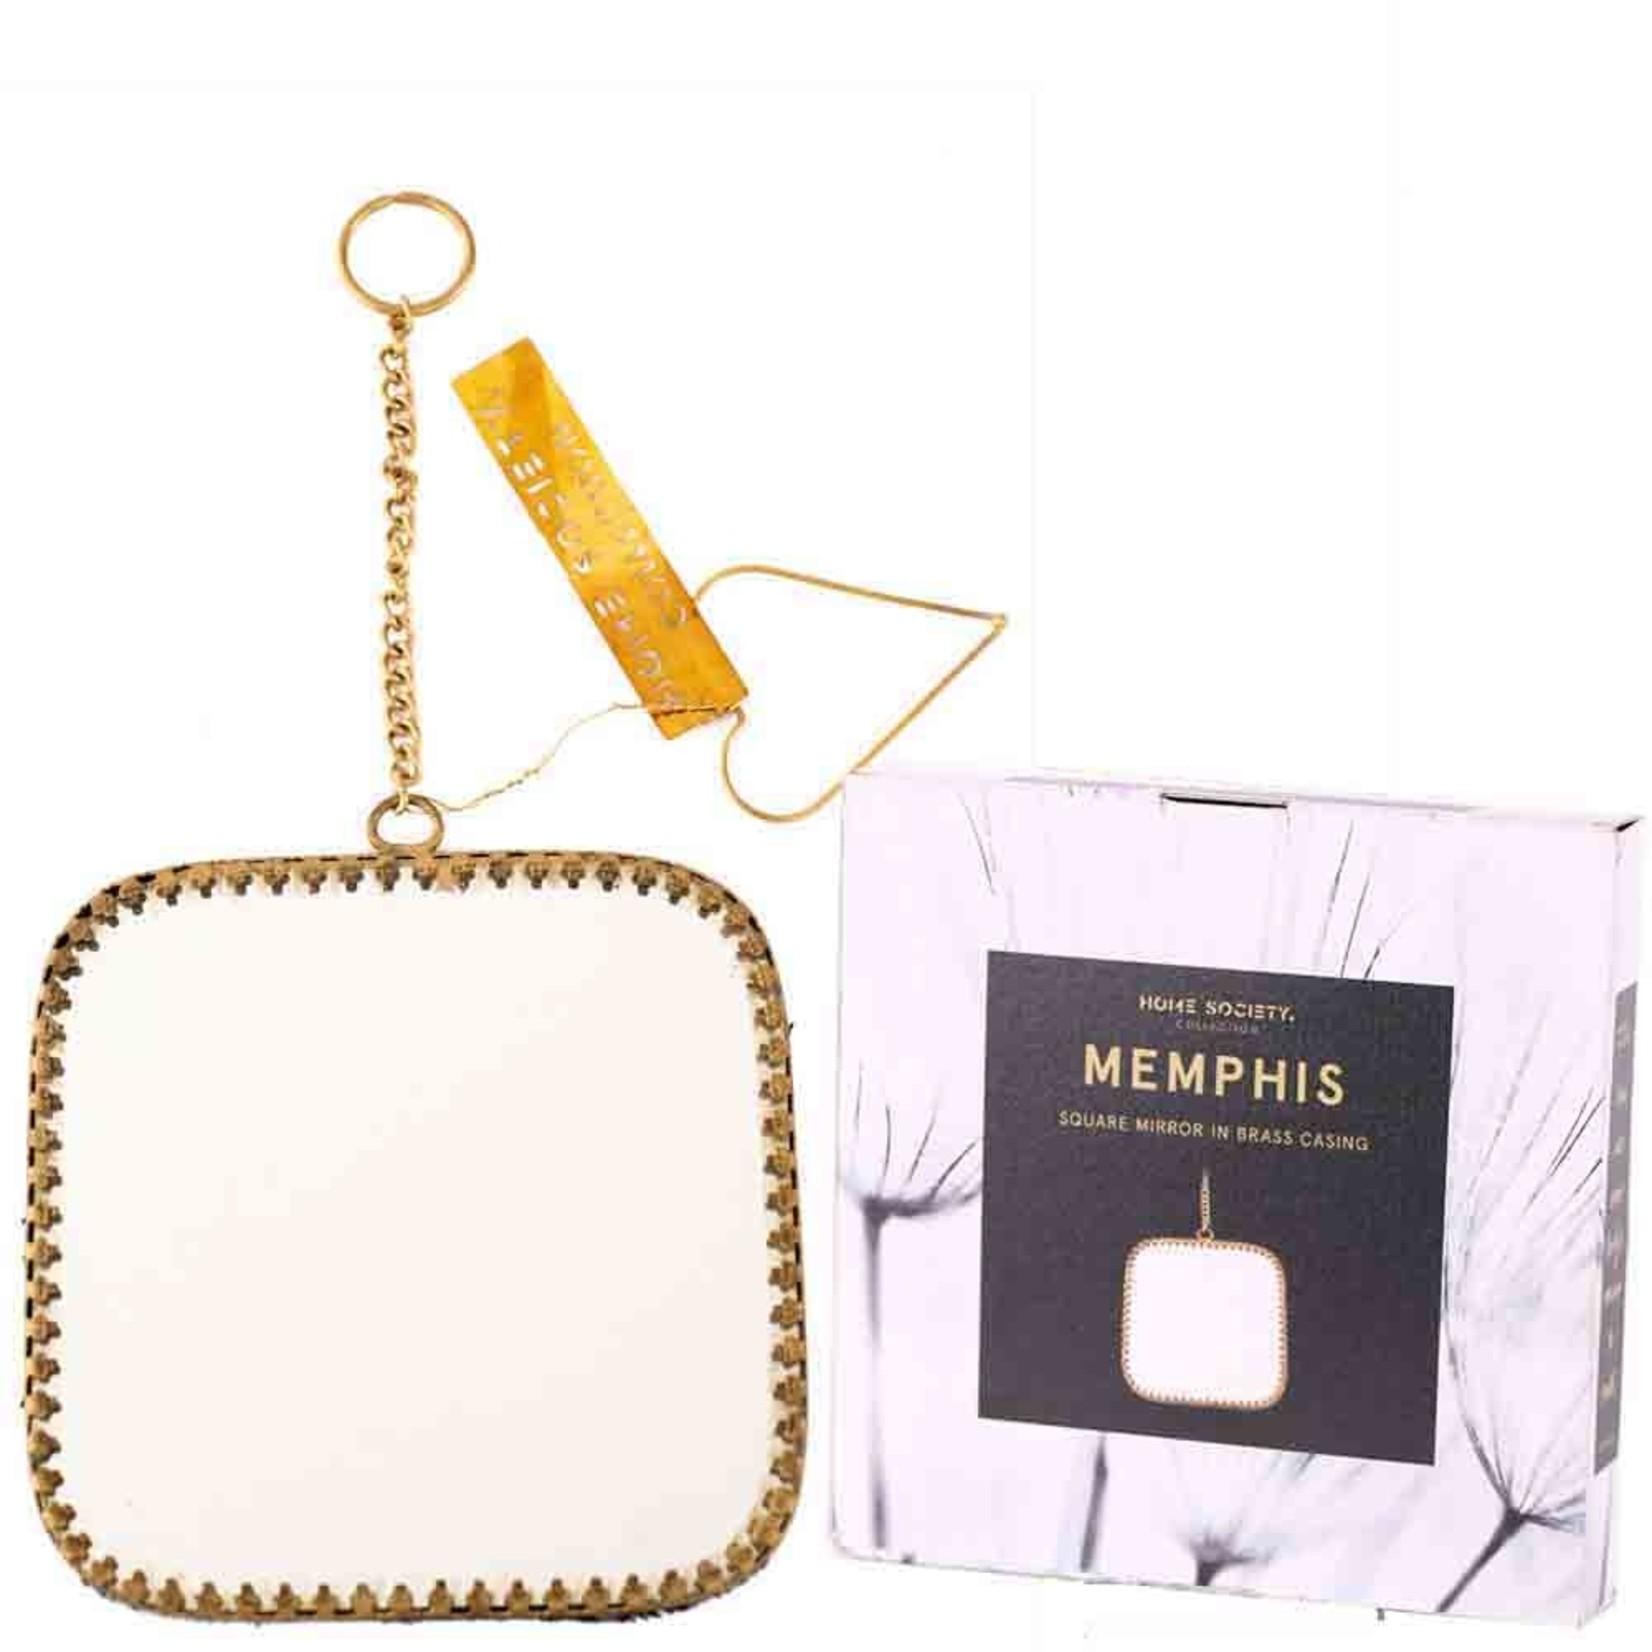 Home Society Mirror Memphis BRA S